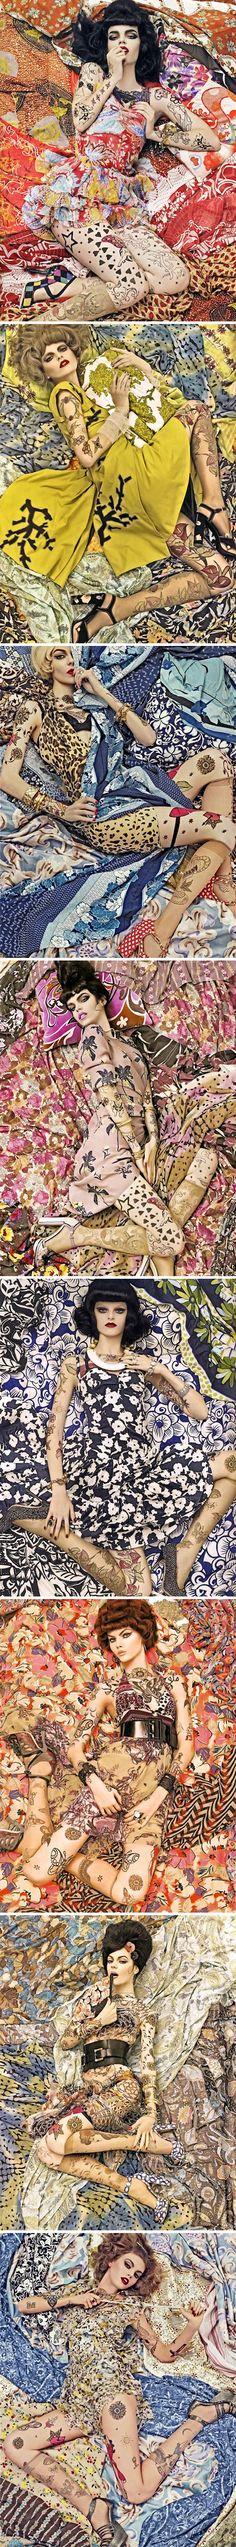 """Vogue patterns"" by Steven Meisel, Vogue Italia, Dec 07. Models Lara Stone…"